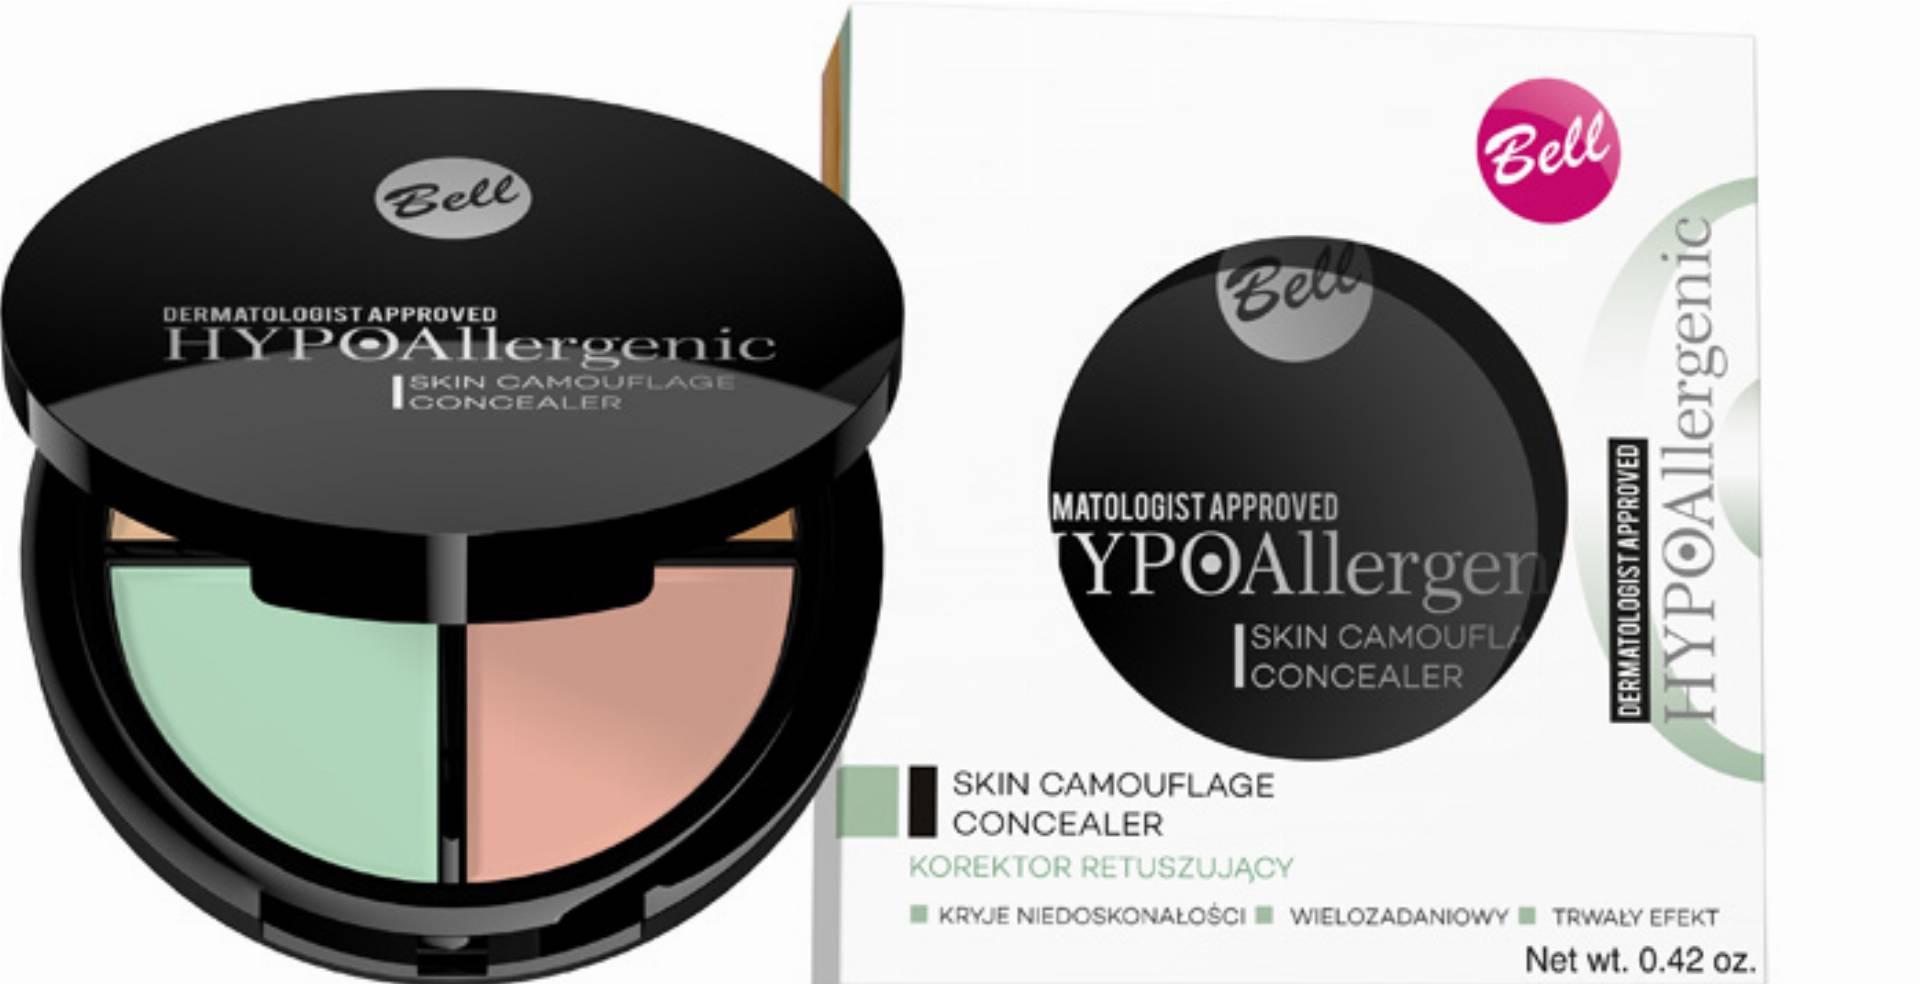 Bell_Hypoallergenic_Skin_Camouflage3